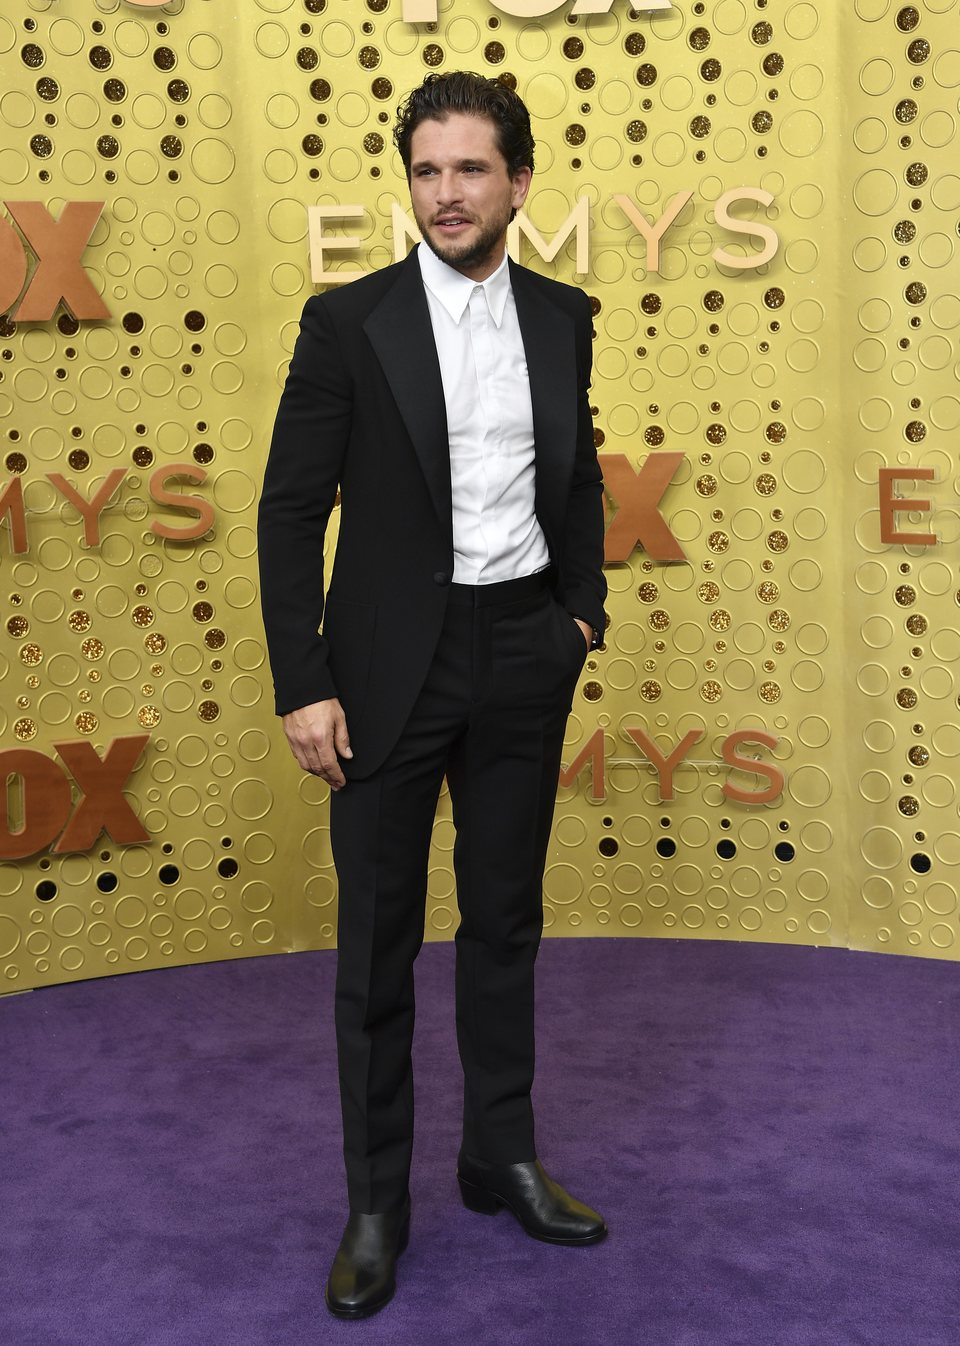 Kit Harrington at the Emmy 2019 red carpet